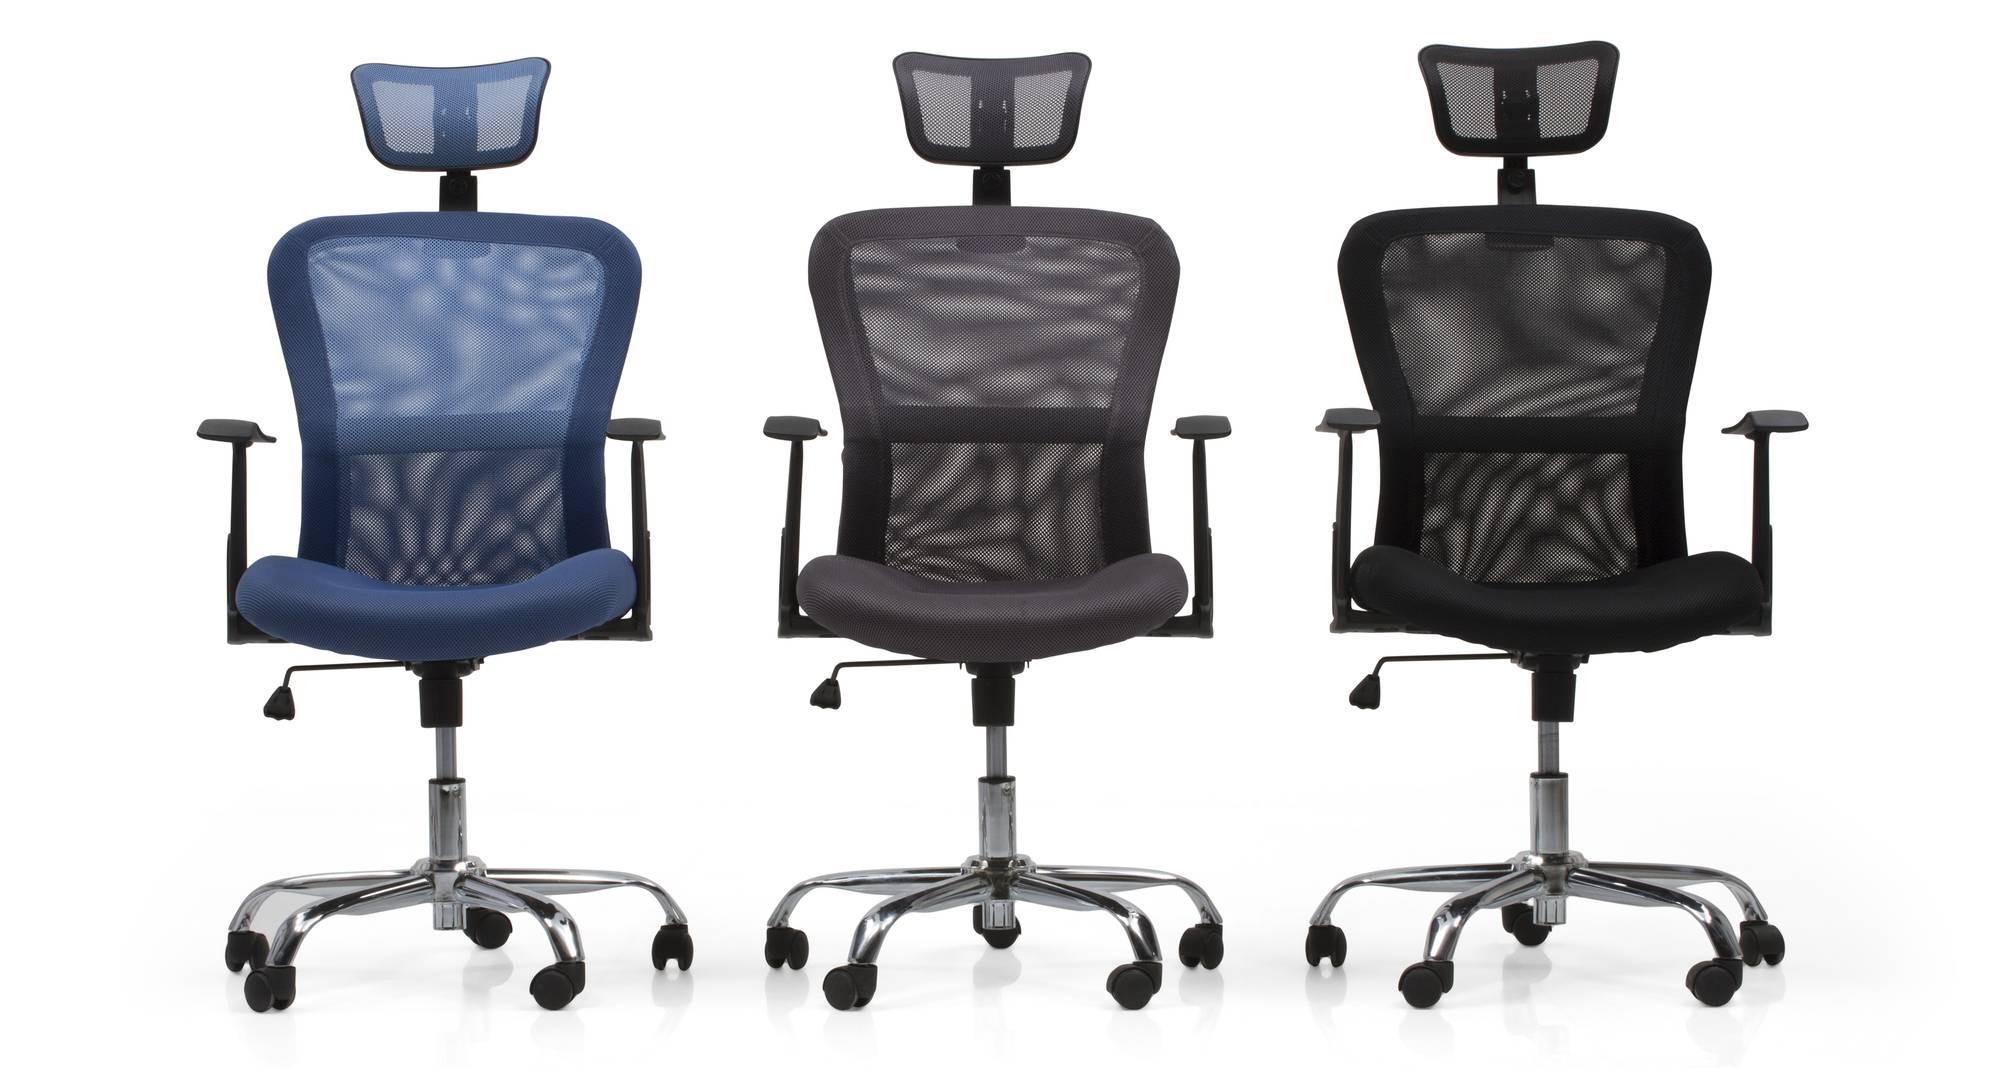 Venturi Study Chair-7 Axis Adjustable